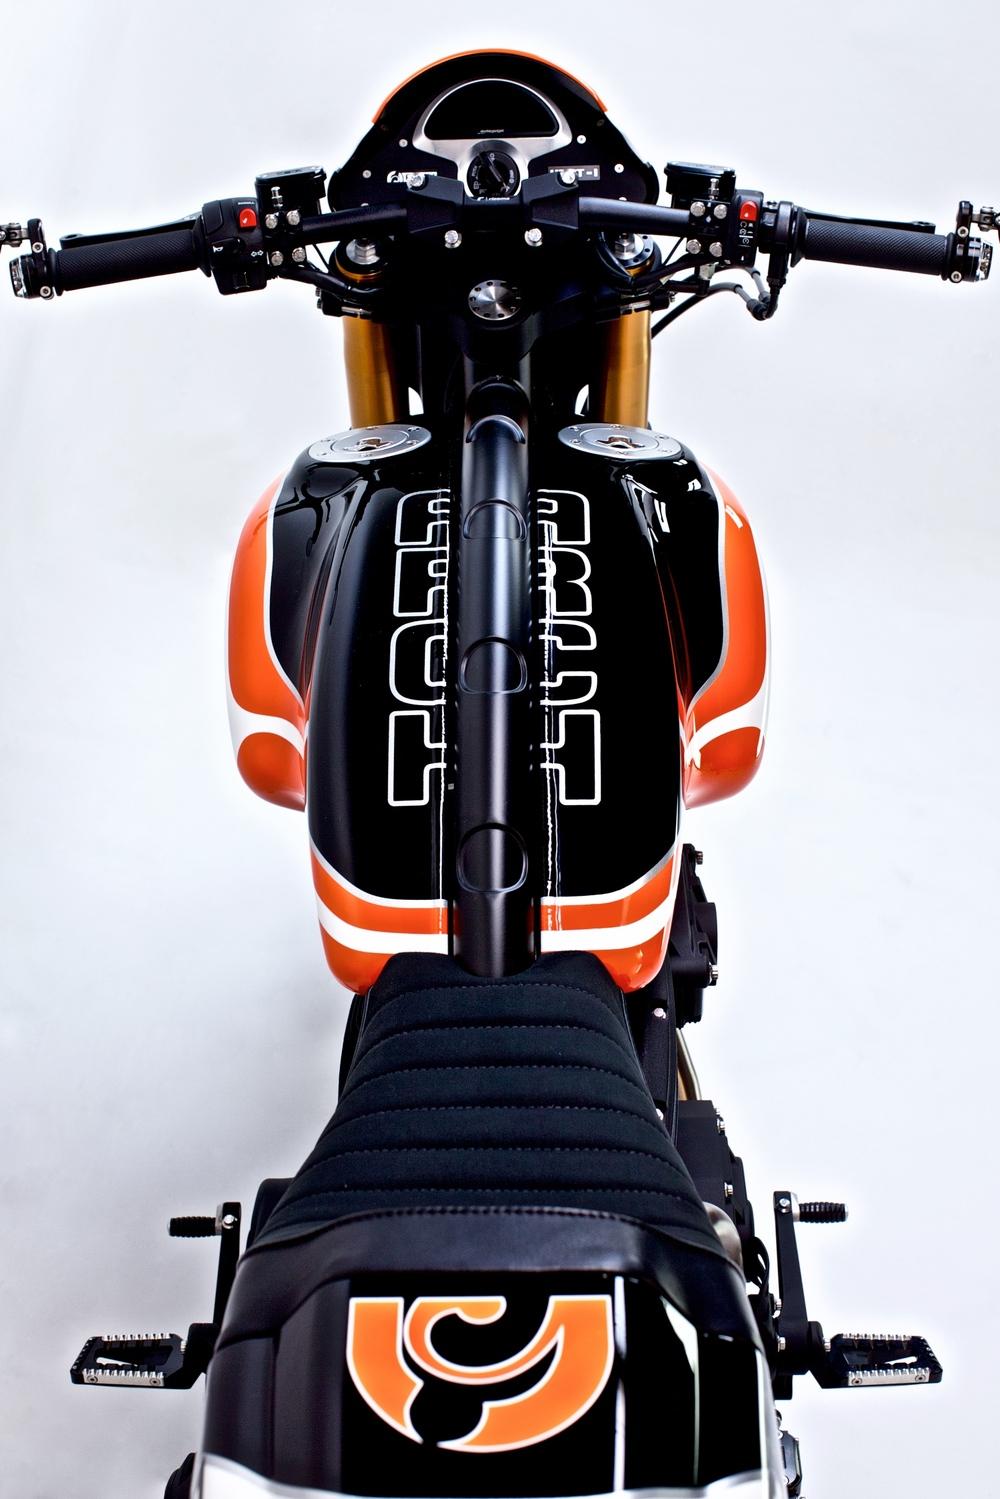 Arch+Orange-Black-White+'16+5_web.jpg